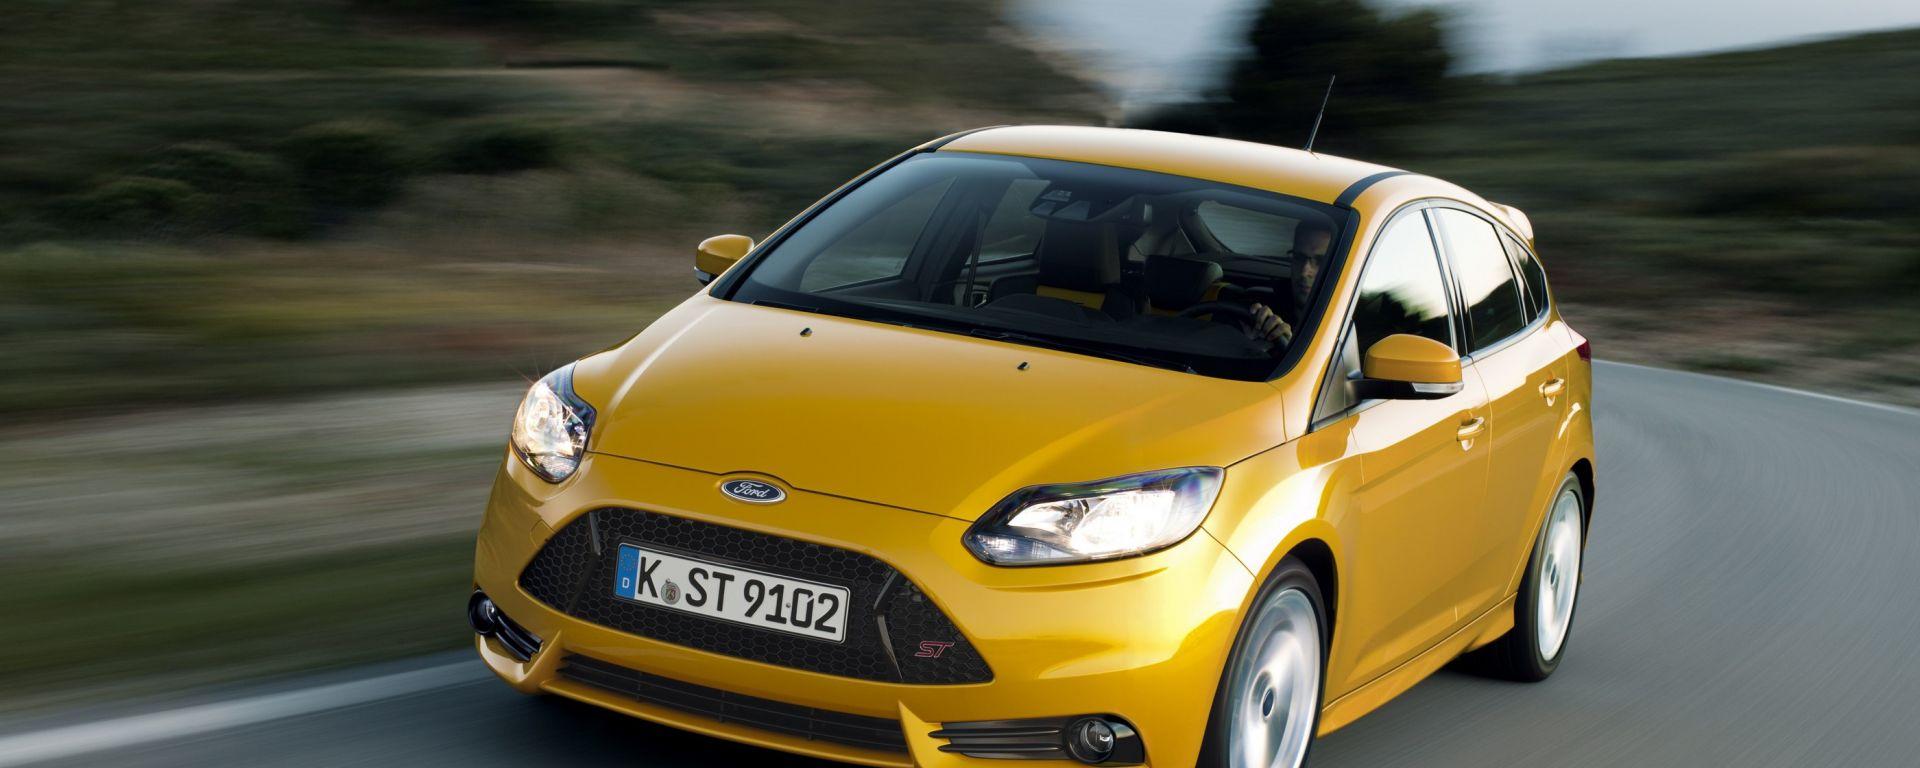 Ford Focus ST, a partire da 30.500 euro